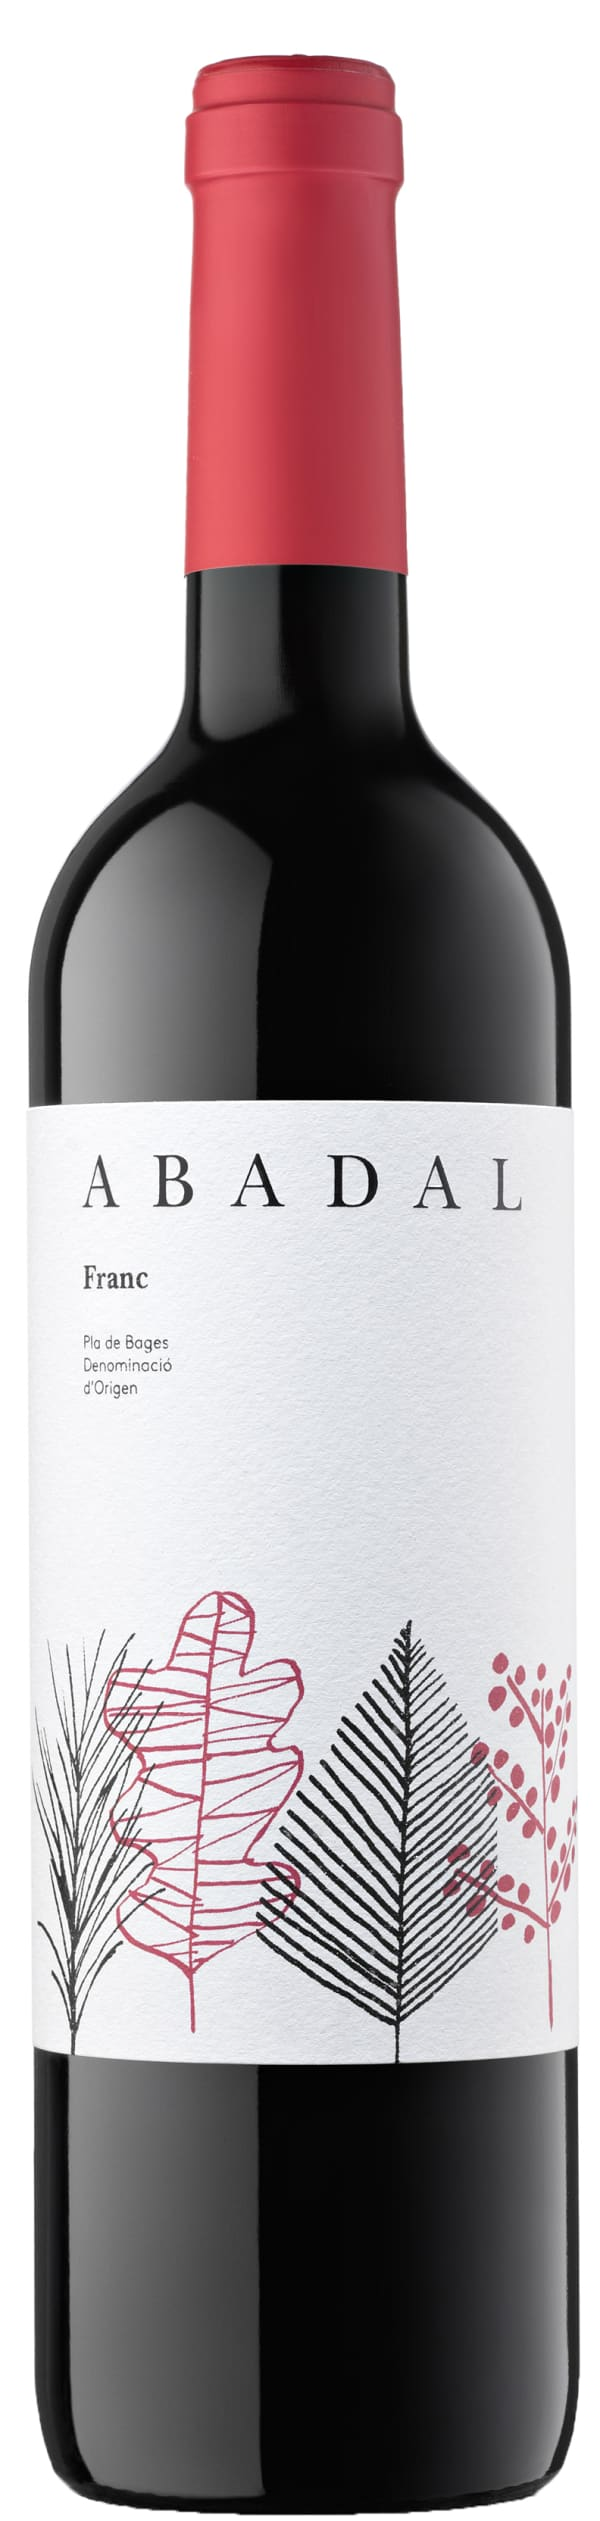 Abadal Franc 2016